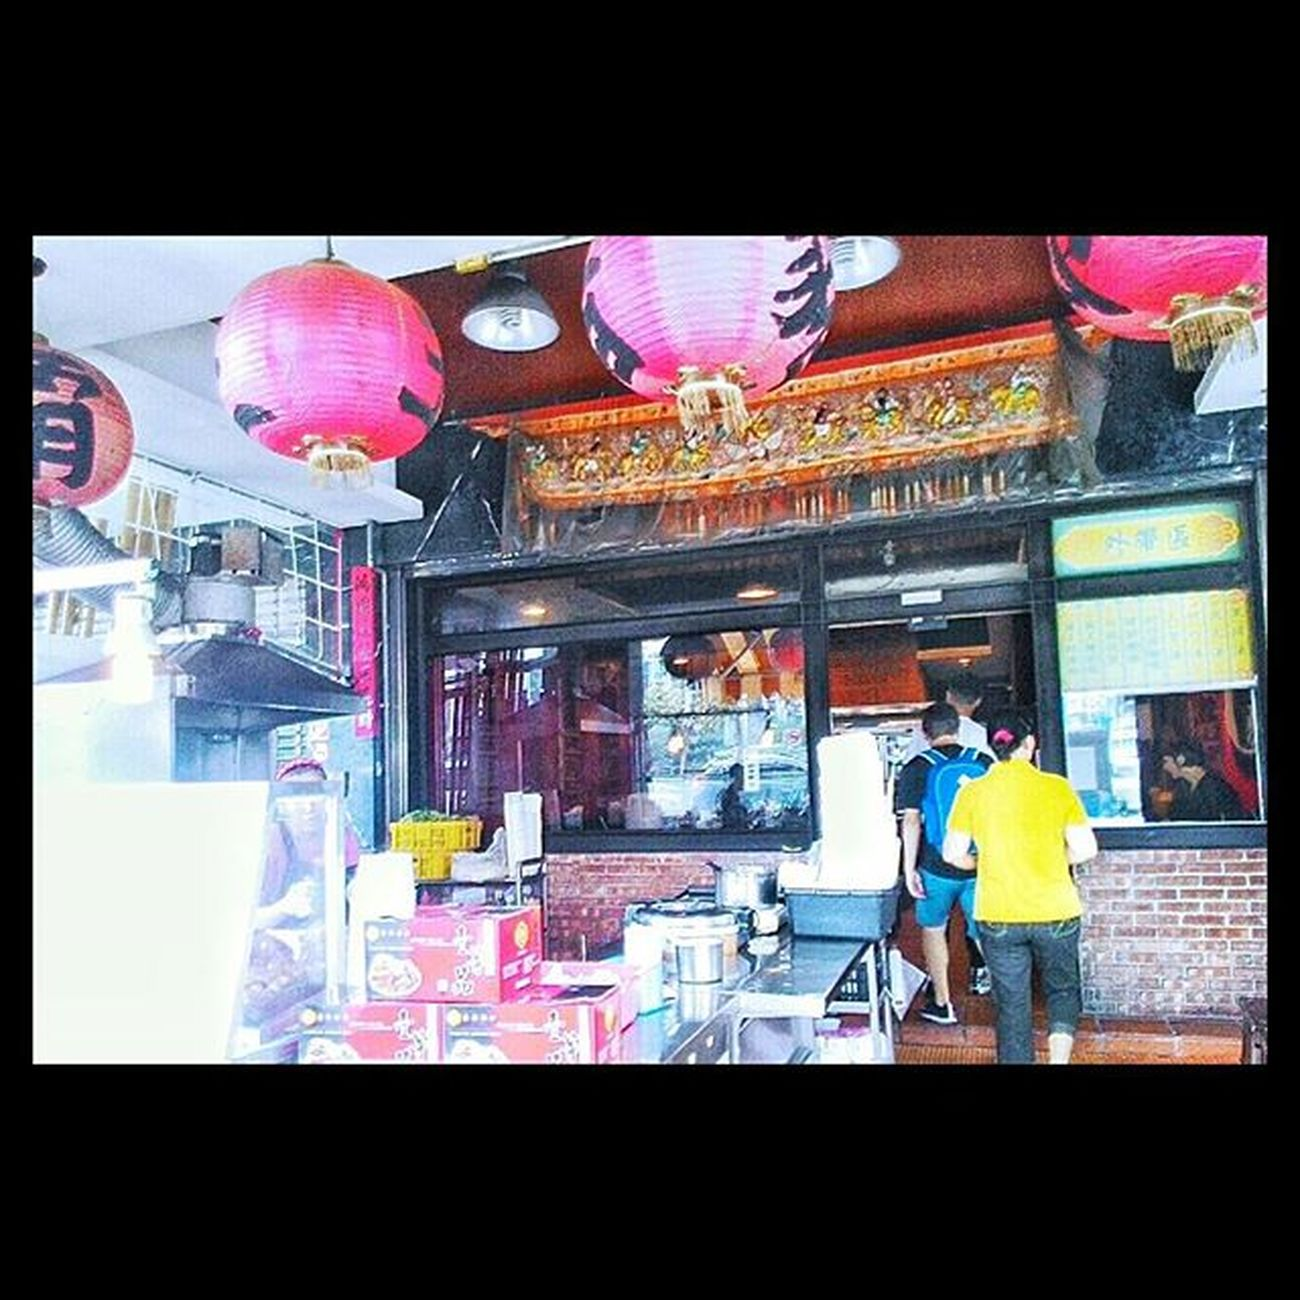 ●X.III.MMXV● 伊巴凱 的招牌 強力 推薦 灰熊齁賈欸迪咖 臺南 AQENの分享文